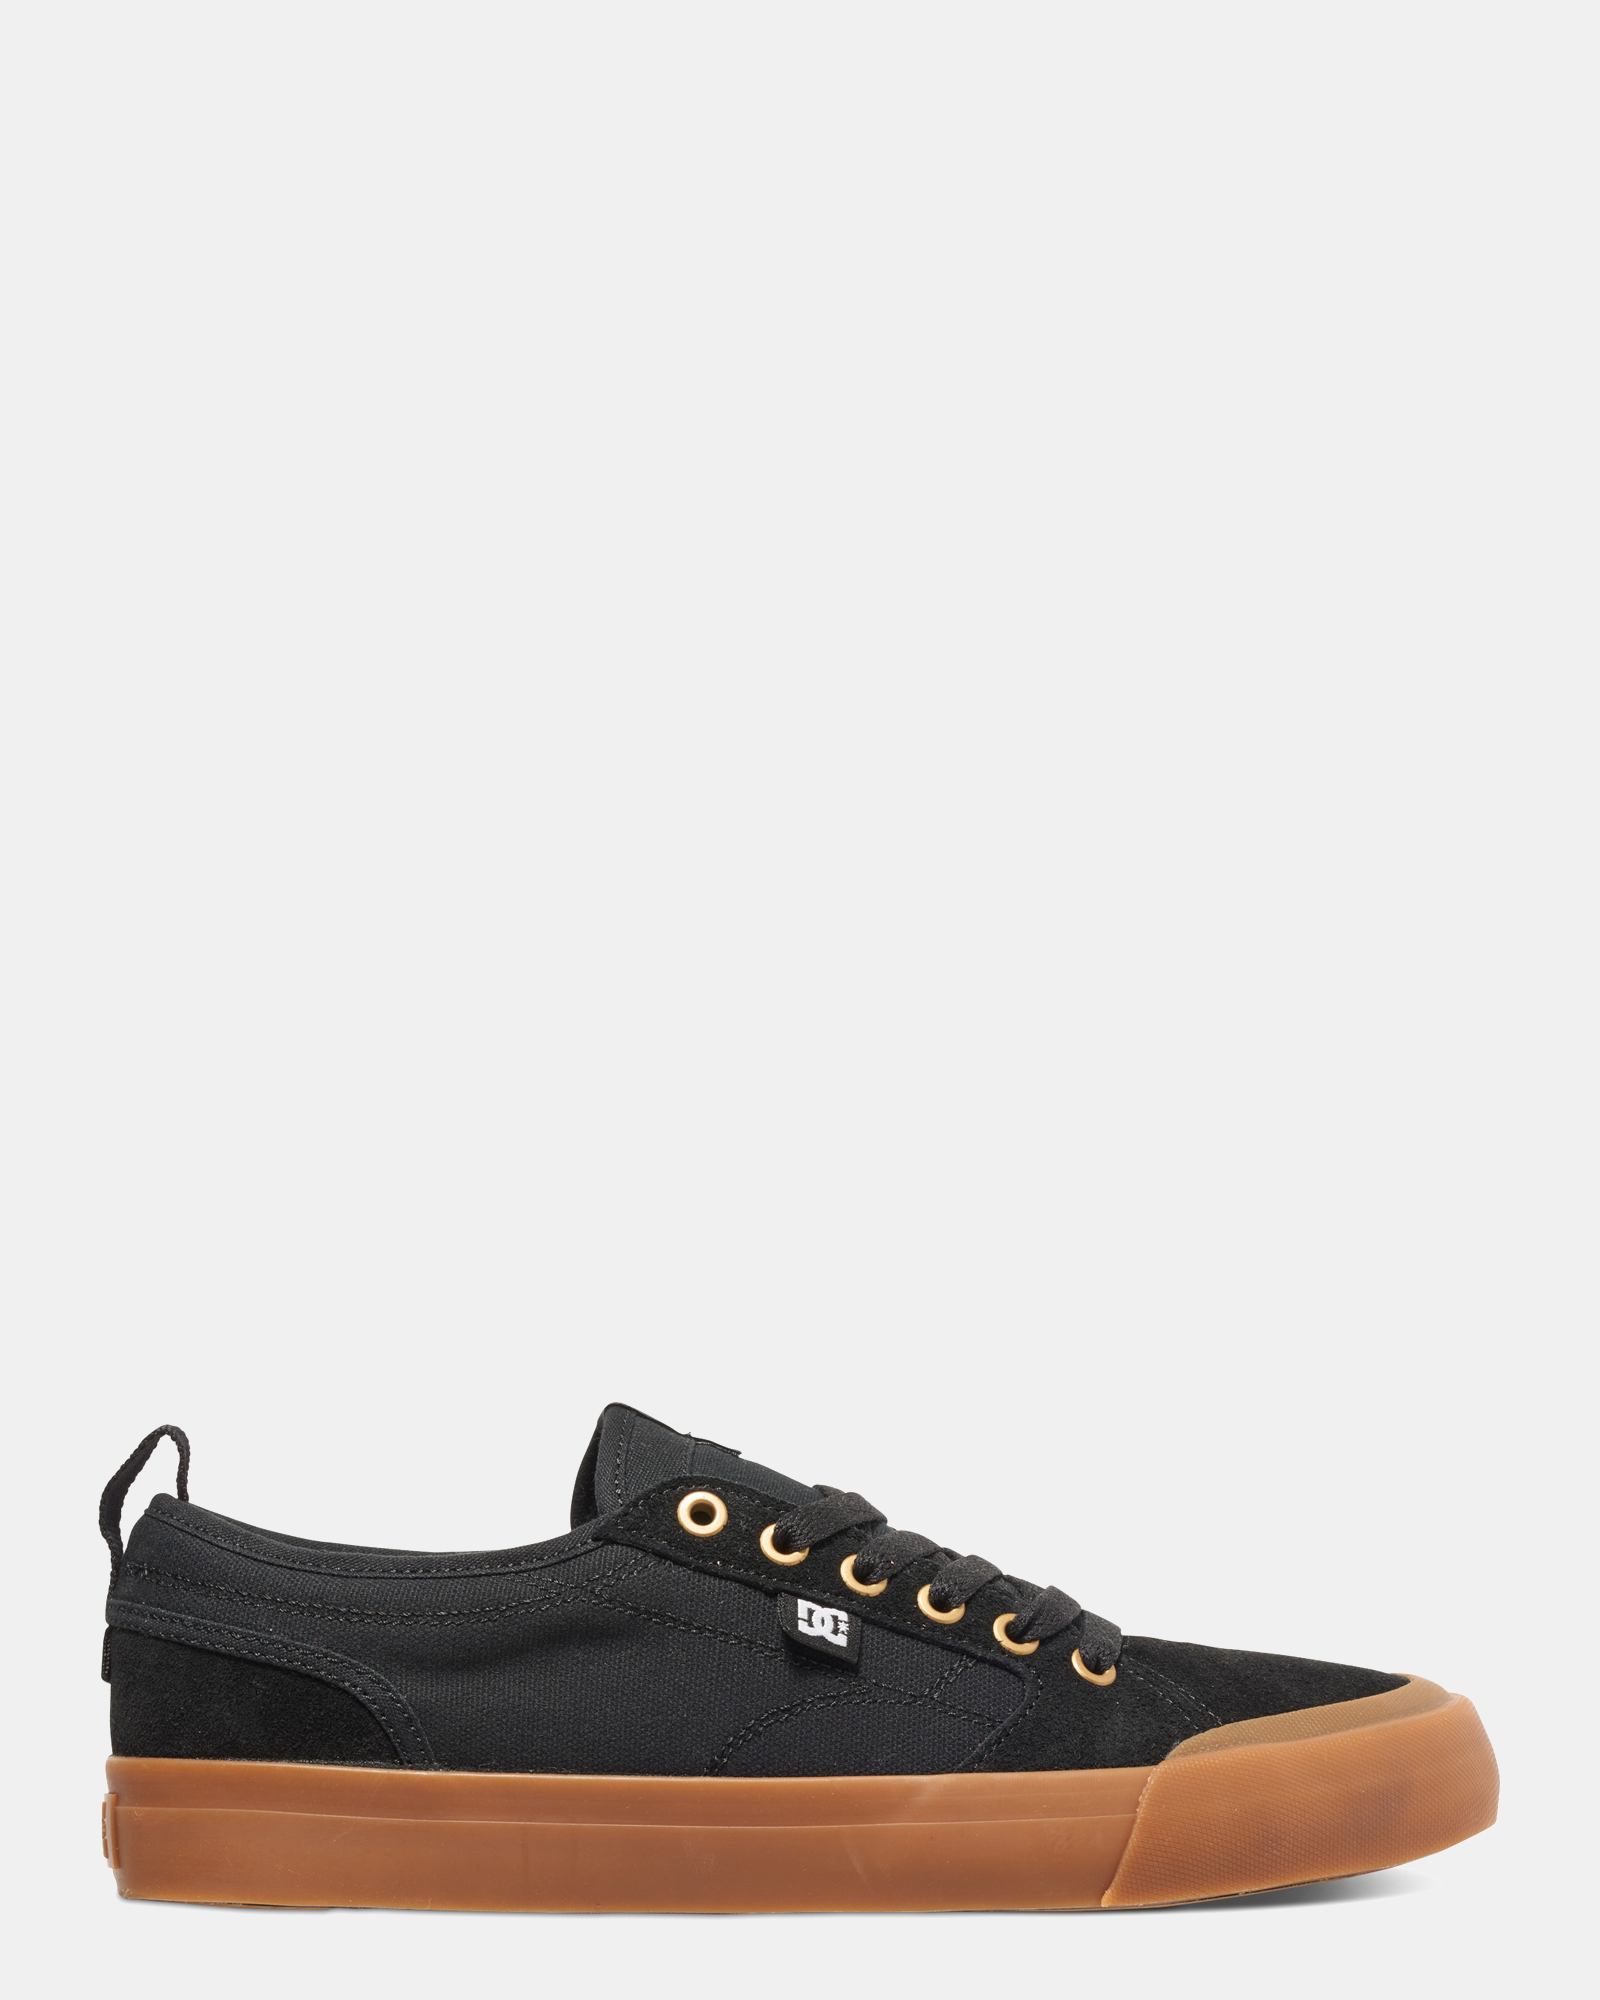 DC Mens Evan Smith S Shoe Black/Gum